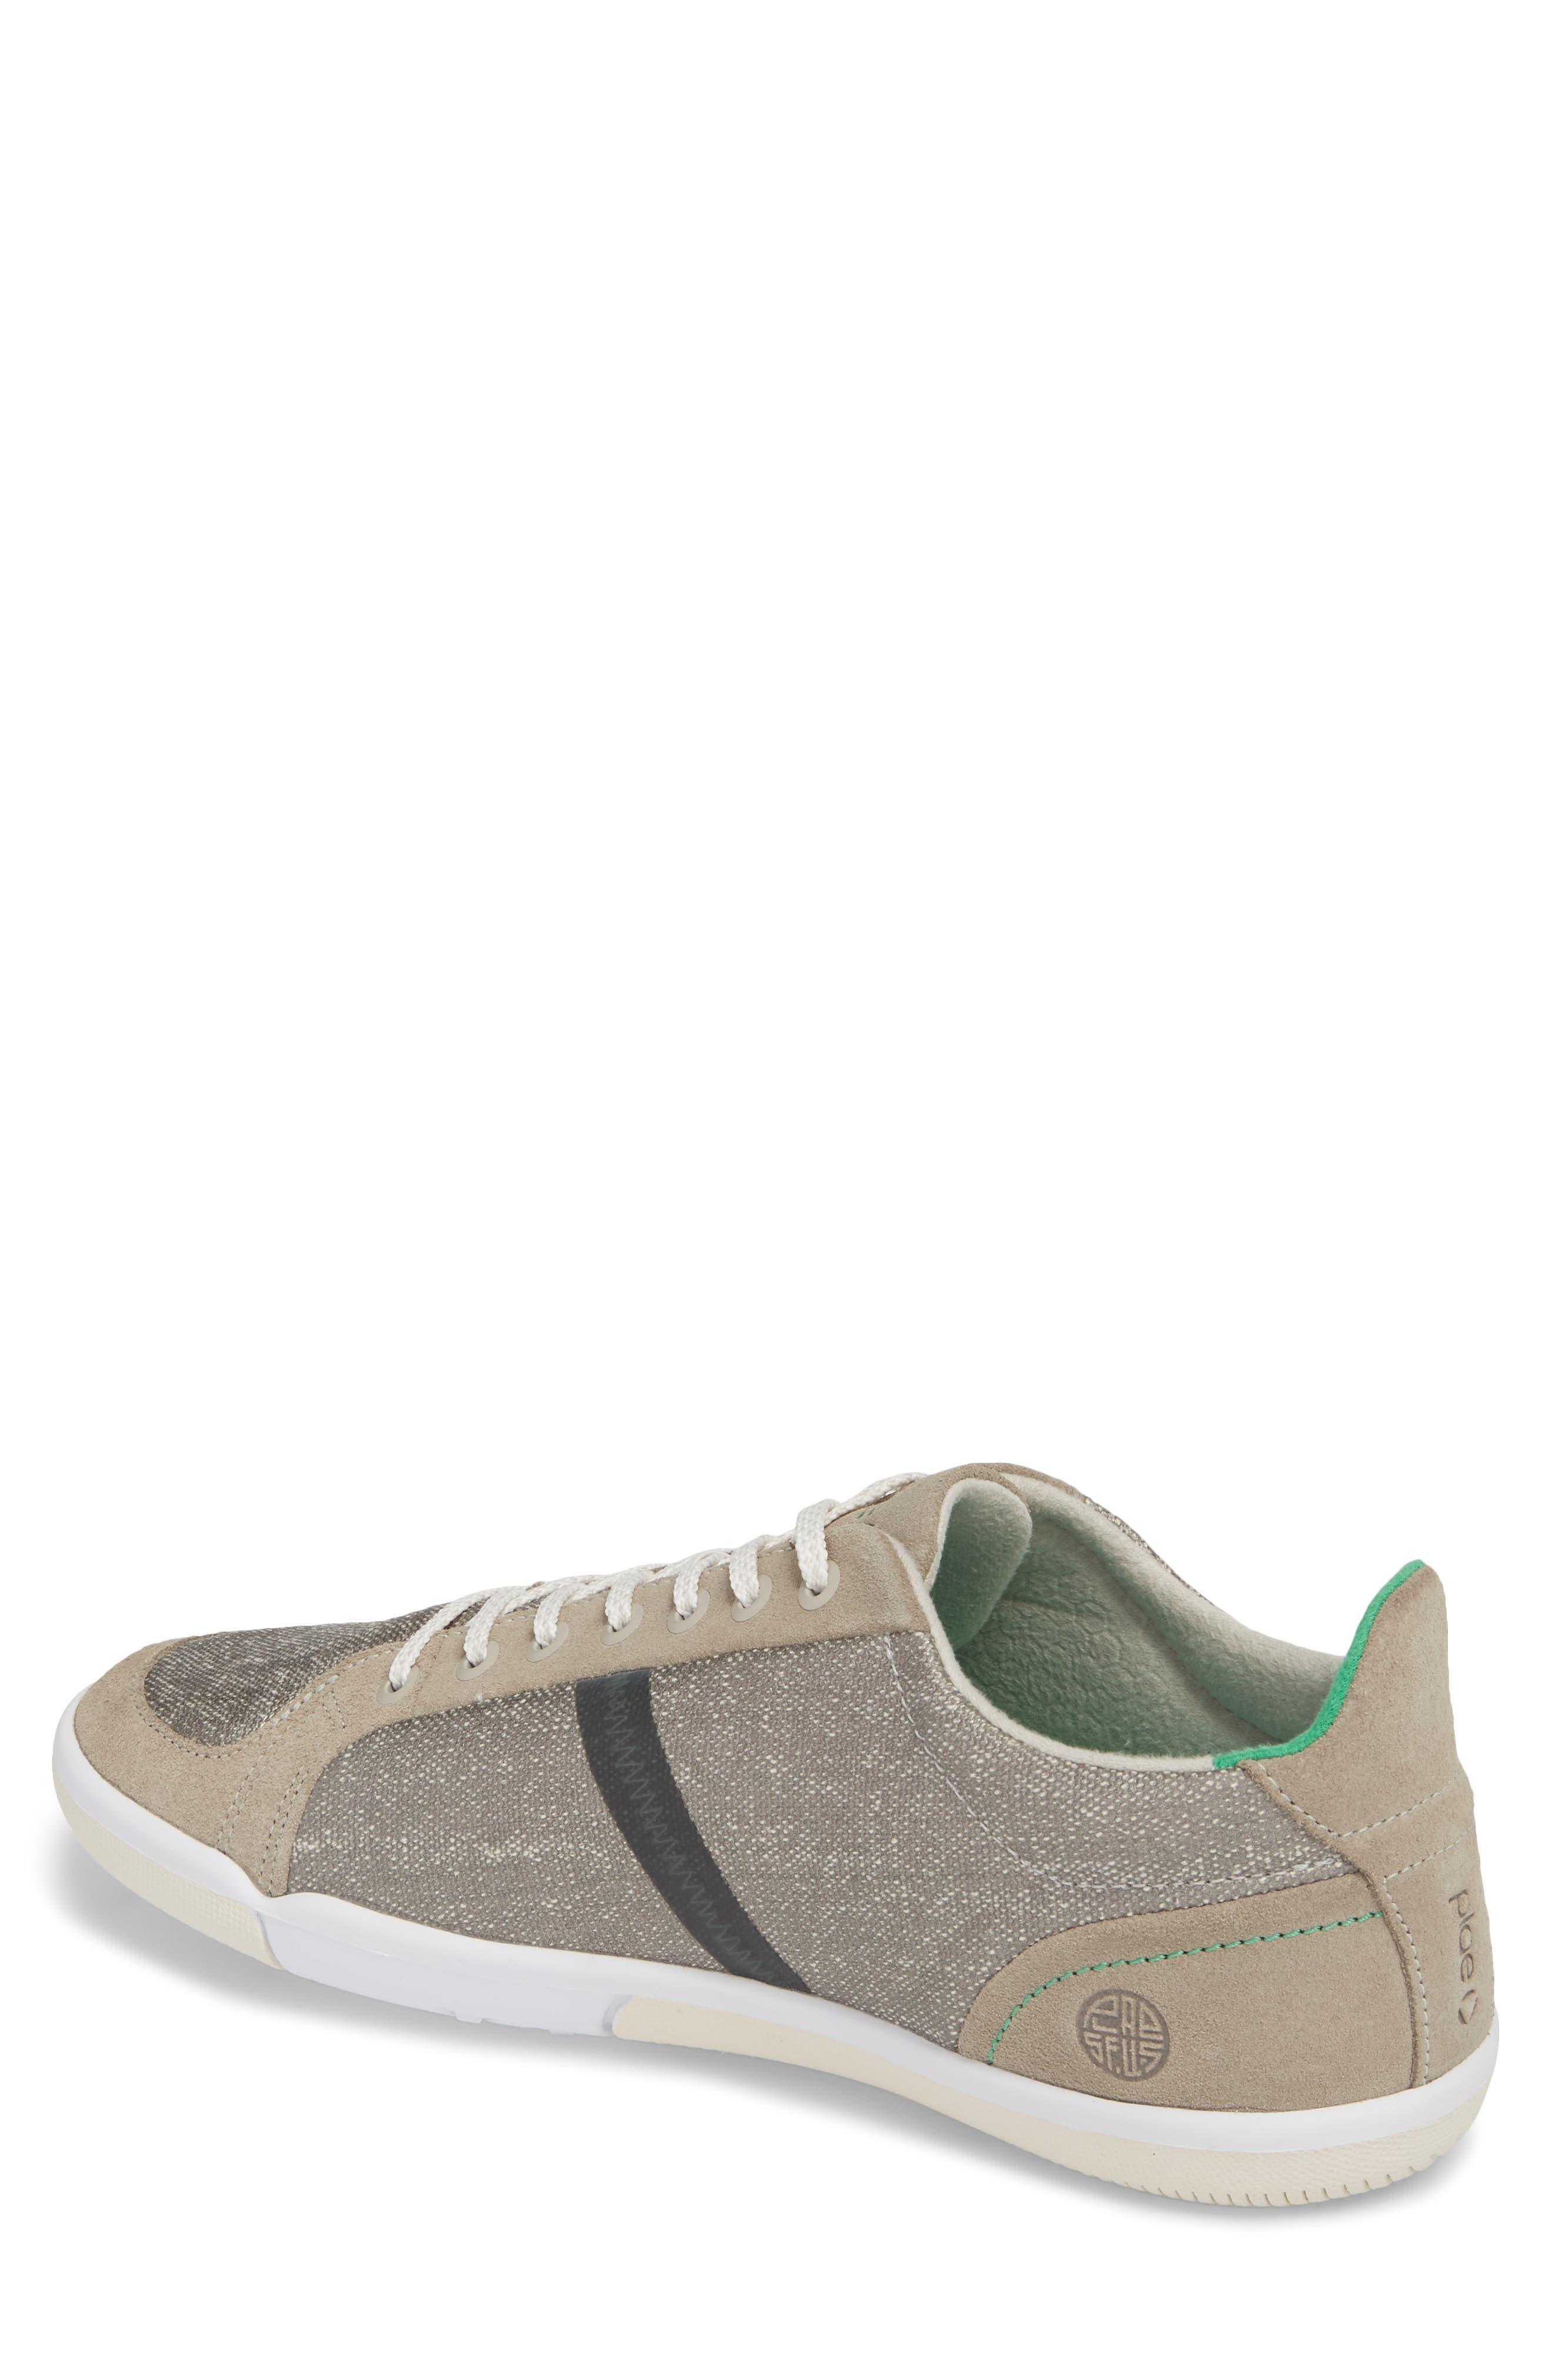 Prospect Low Top Sneaker,                             Alternate thumbnail 2, color,                             Stone